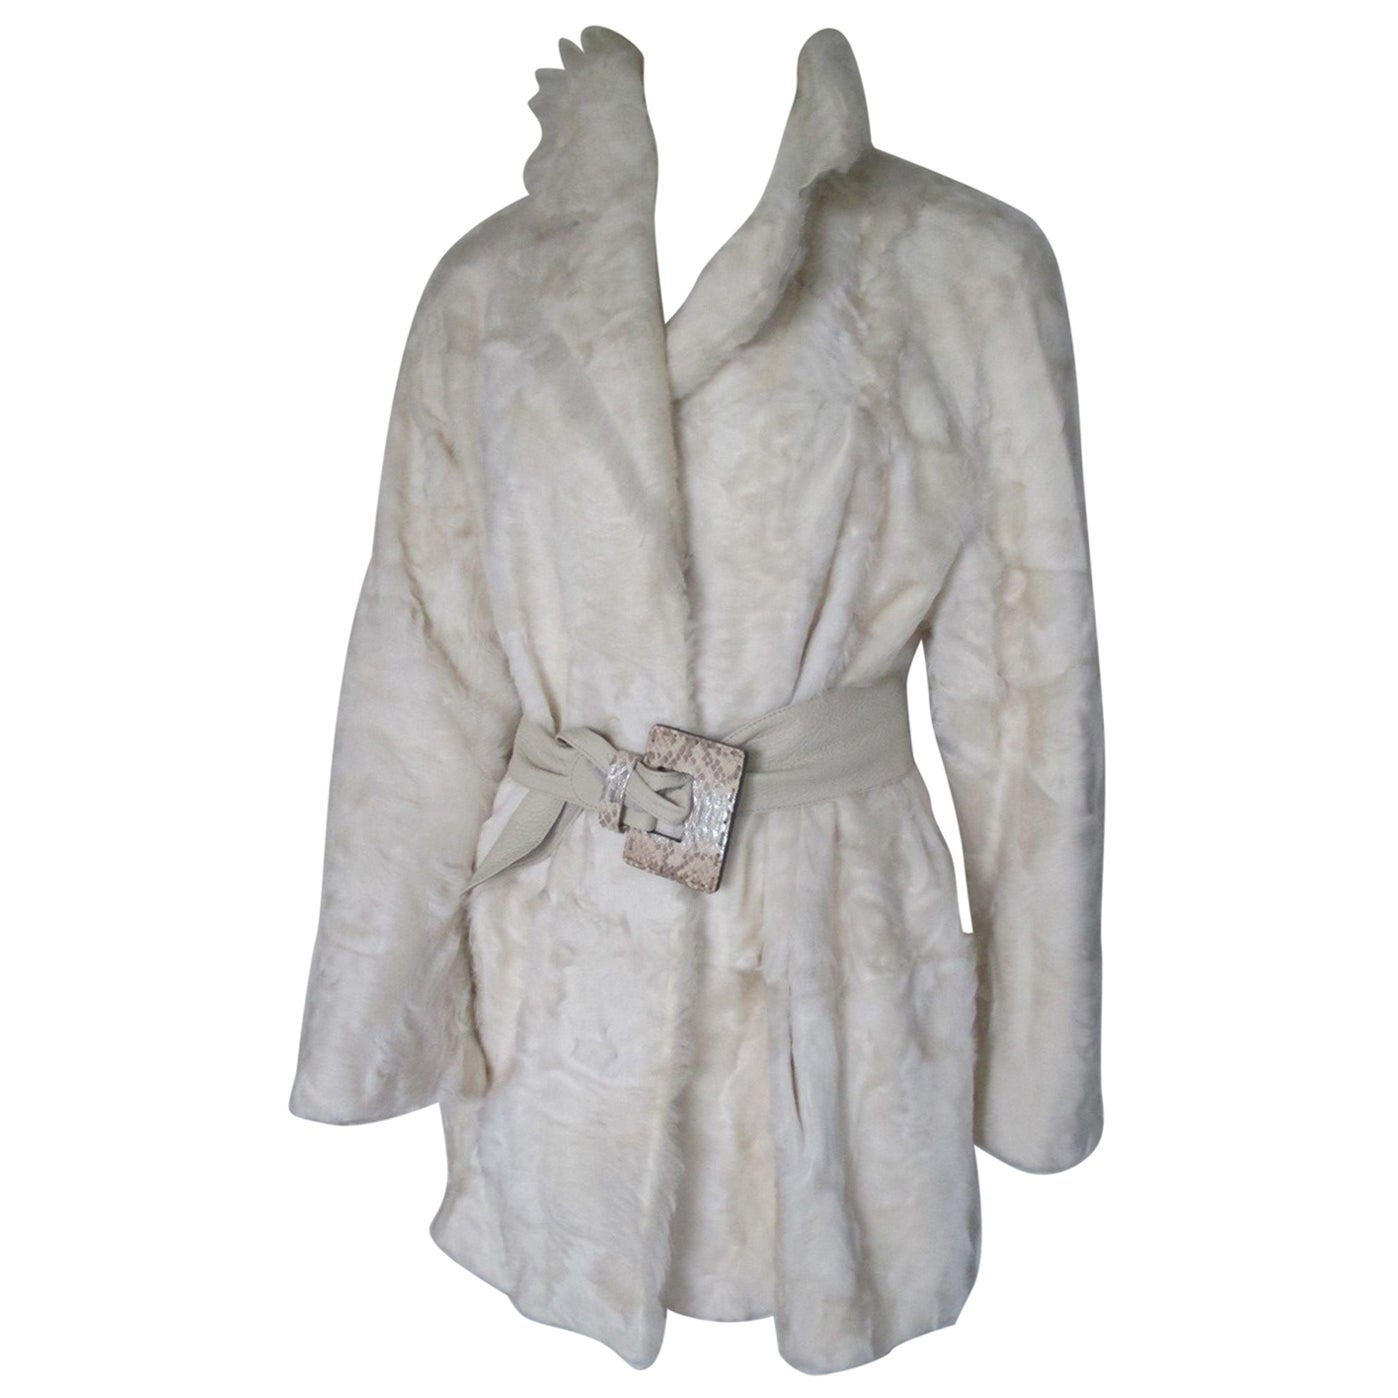 Ivory Goat Lamb Fur Coat Light weight